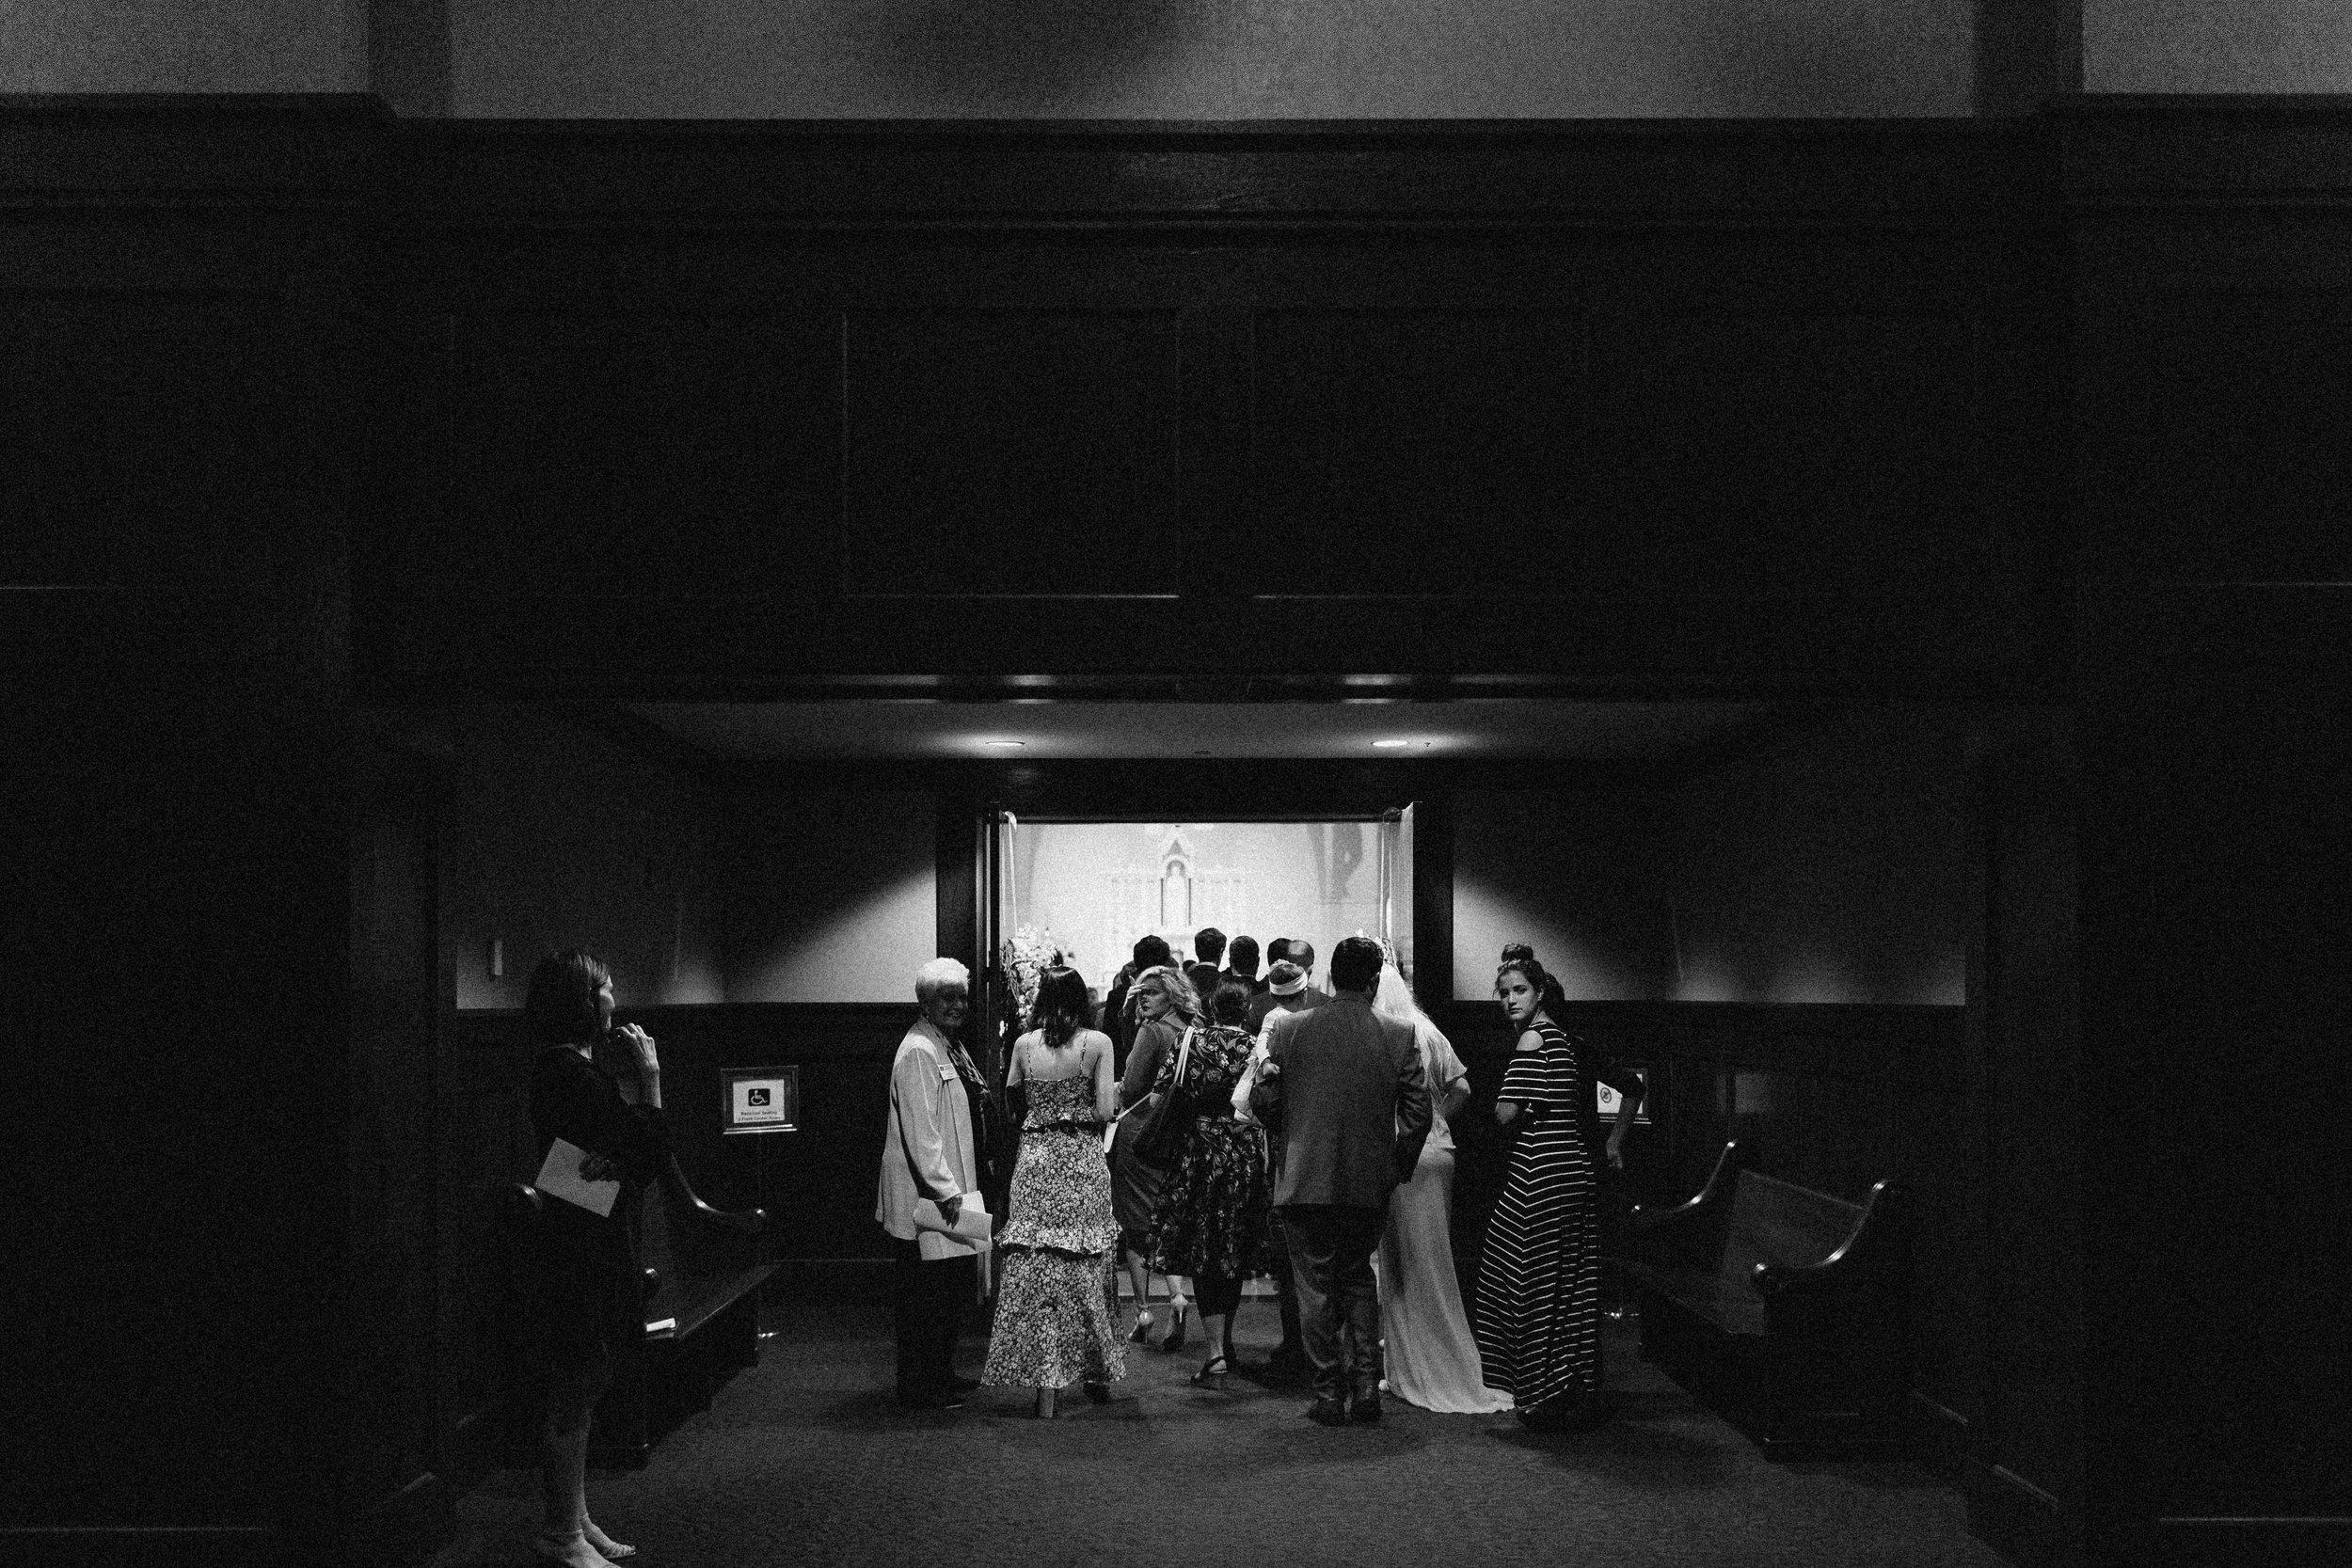 roswell_st_peter_chanel_catholic_avalon_hotel_alpharetta_wedding-1368.jpg